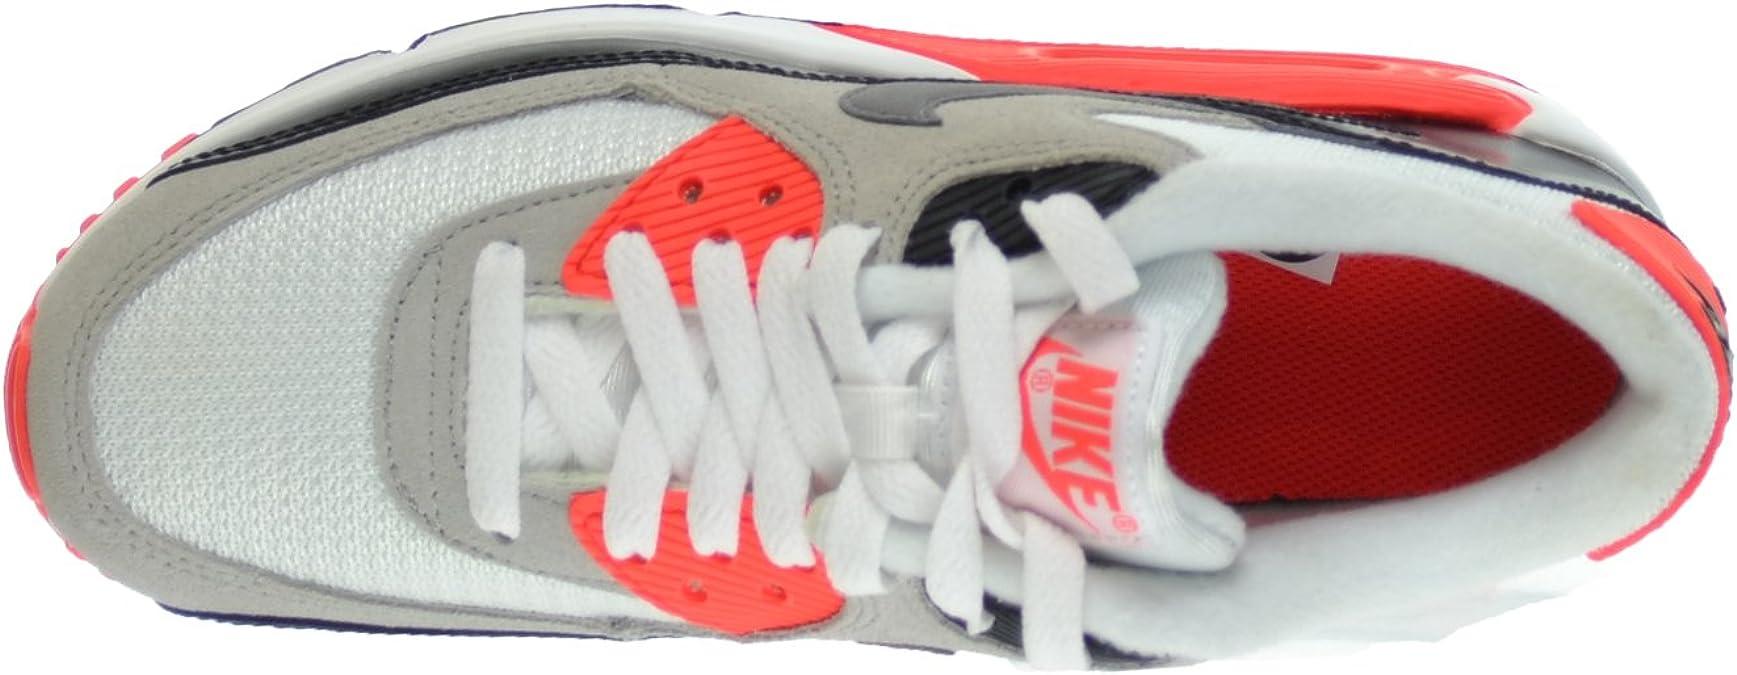 Nike Air Max 90 Premium Mesh (GS) Big Kids Shoes WhiteCool Grey Natural Grey Black 724882 100